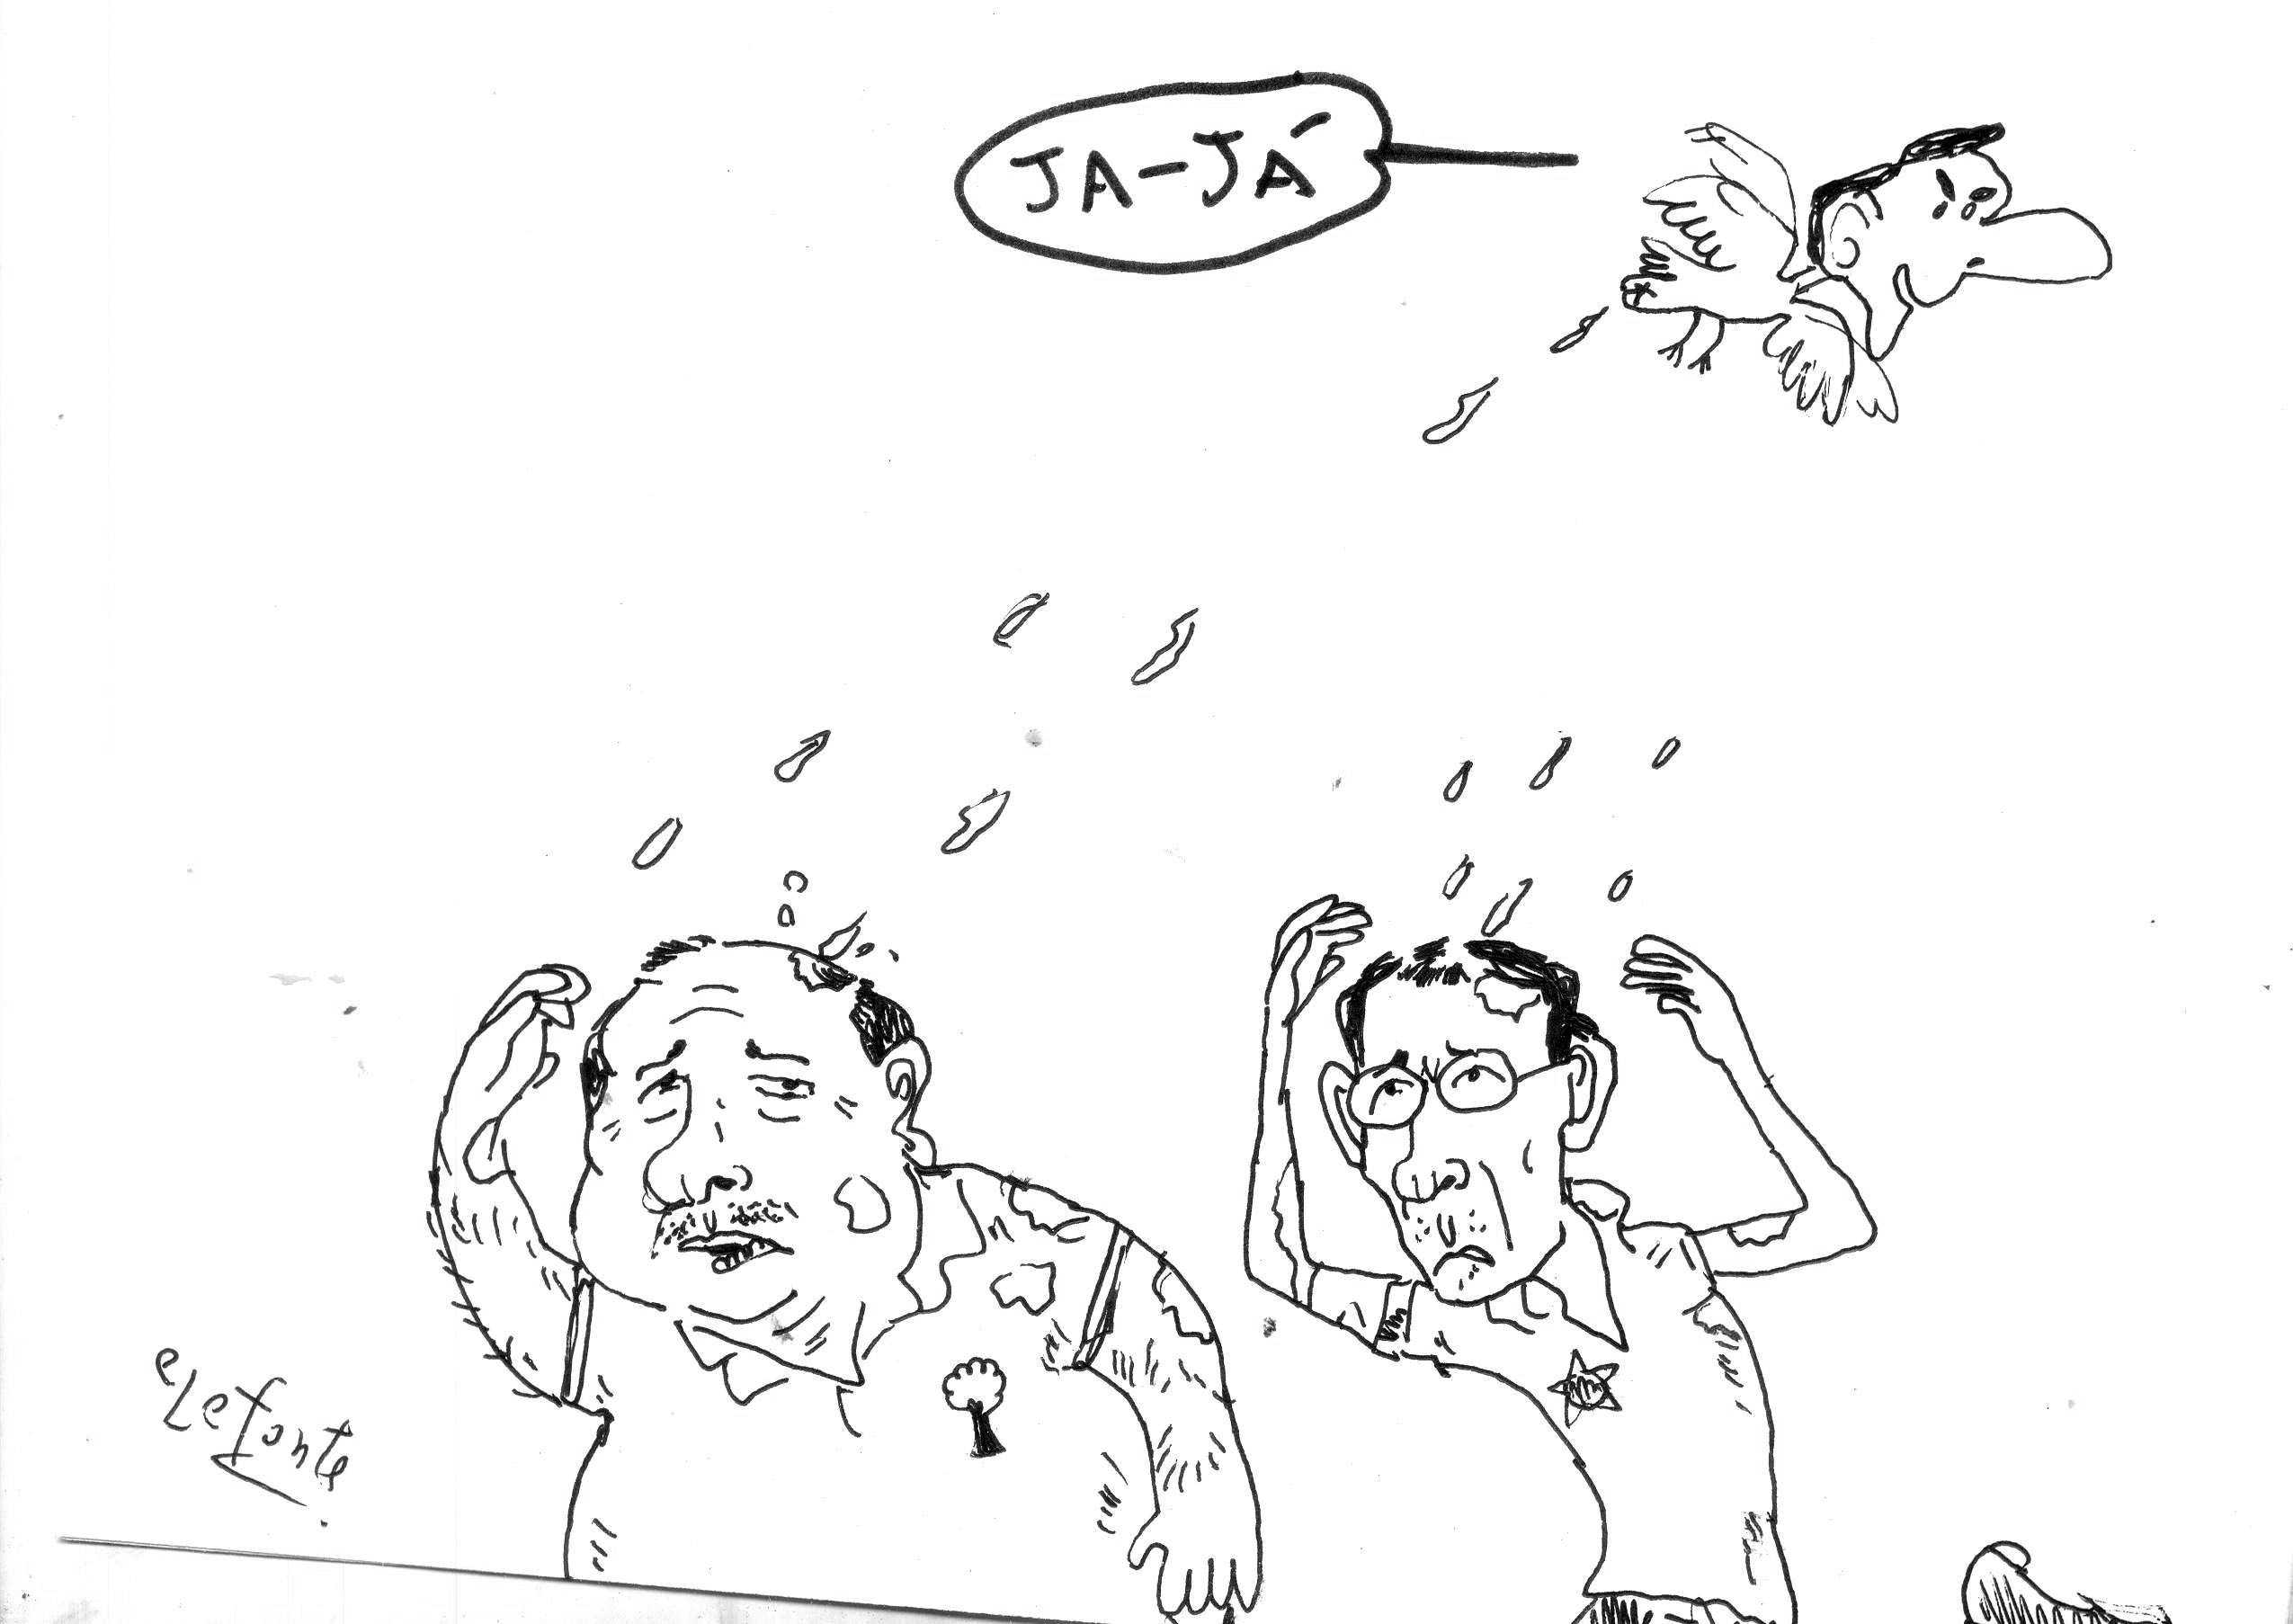 07/03/2013